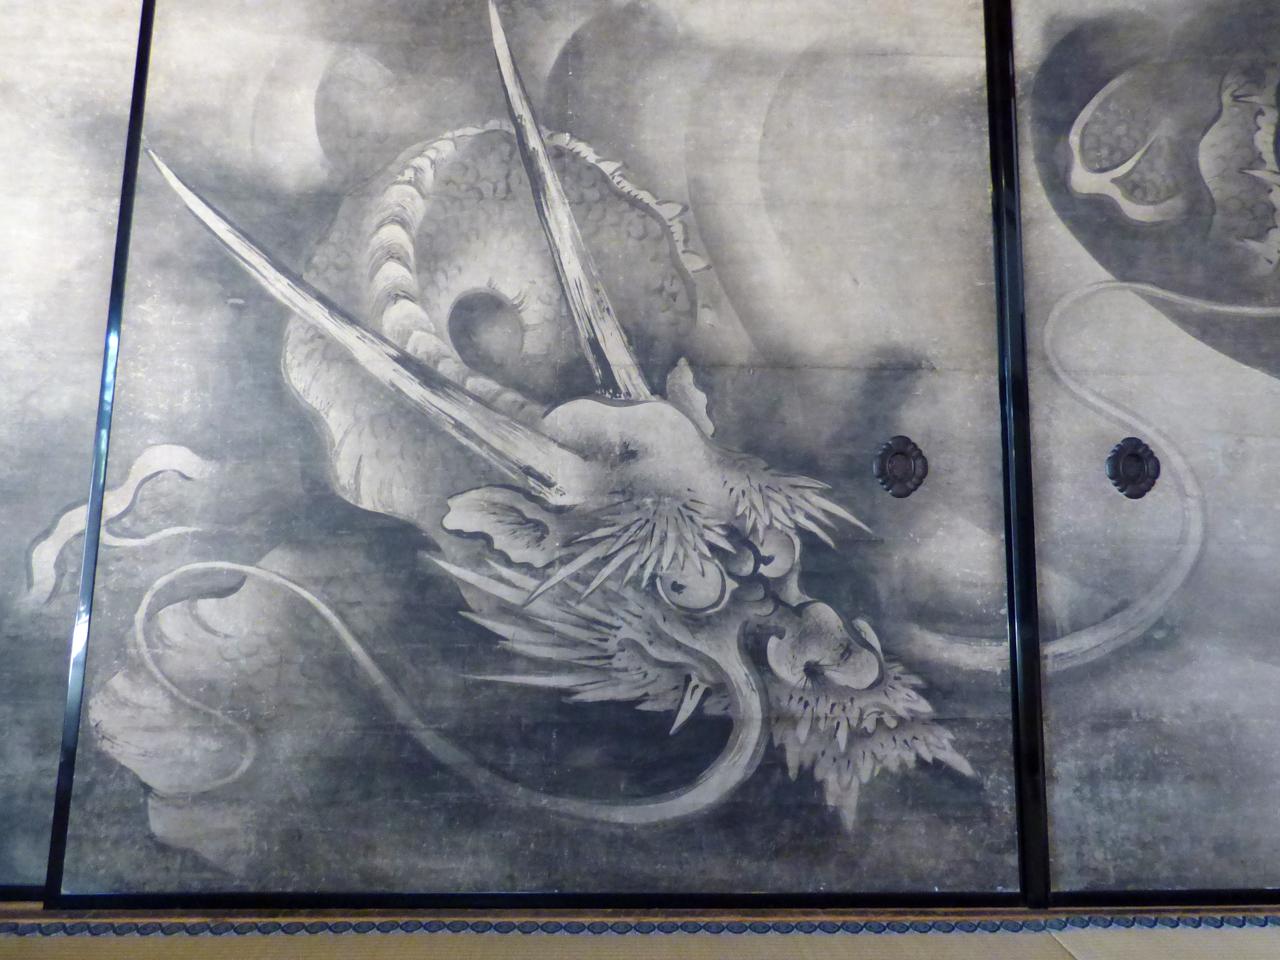 建仁寺の雲龍図襖絵